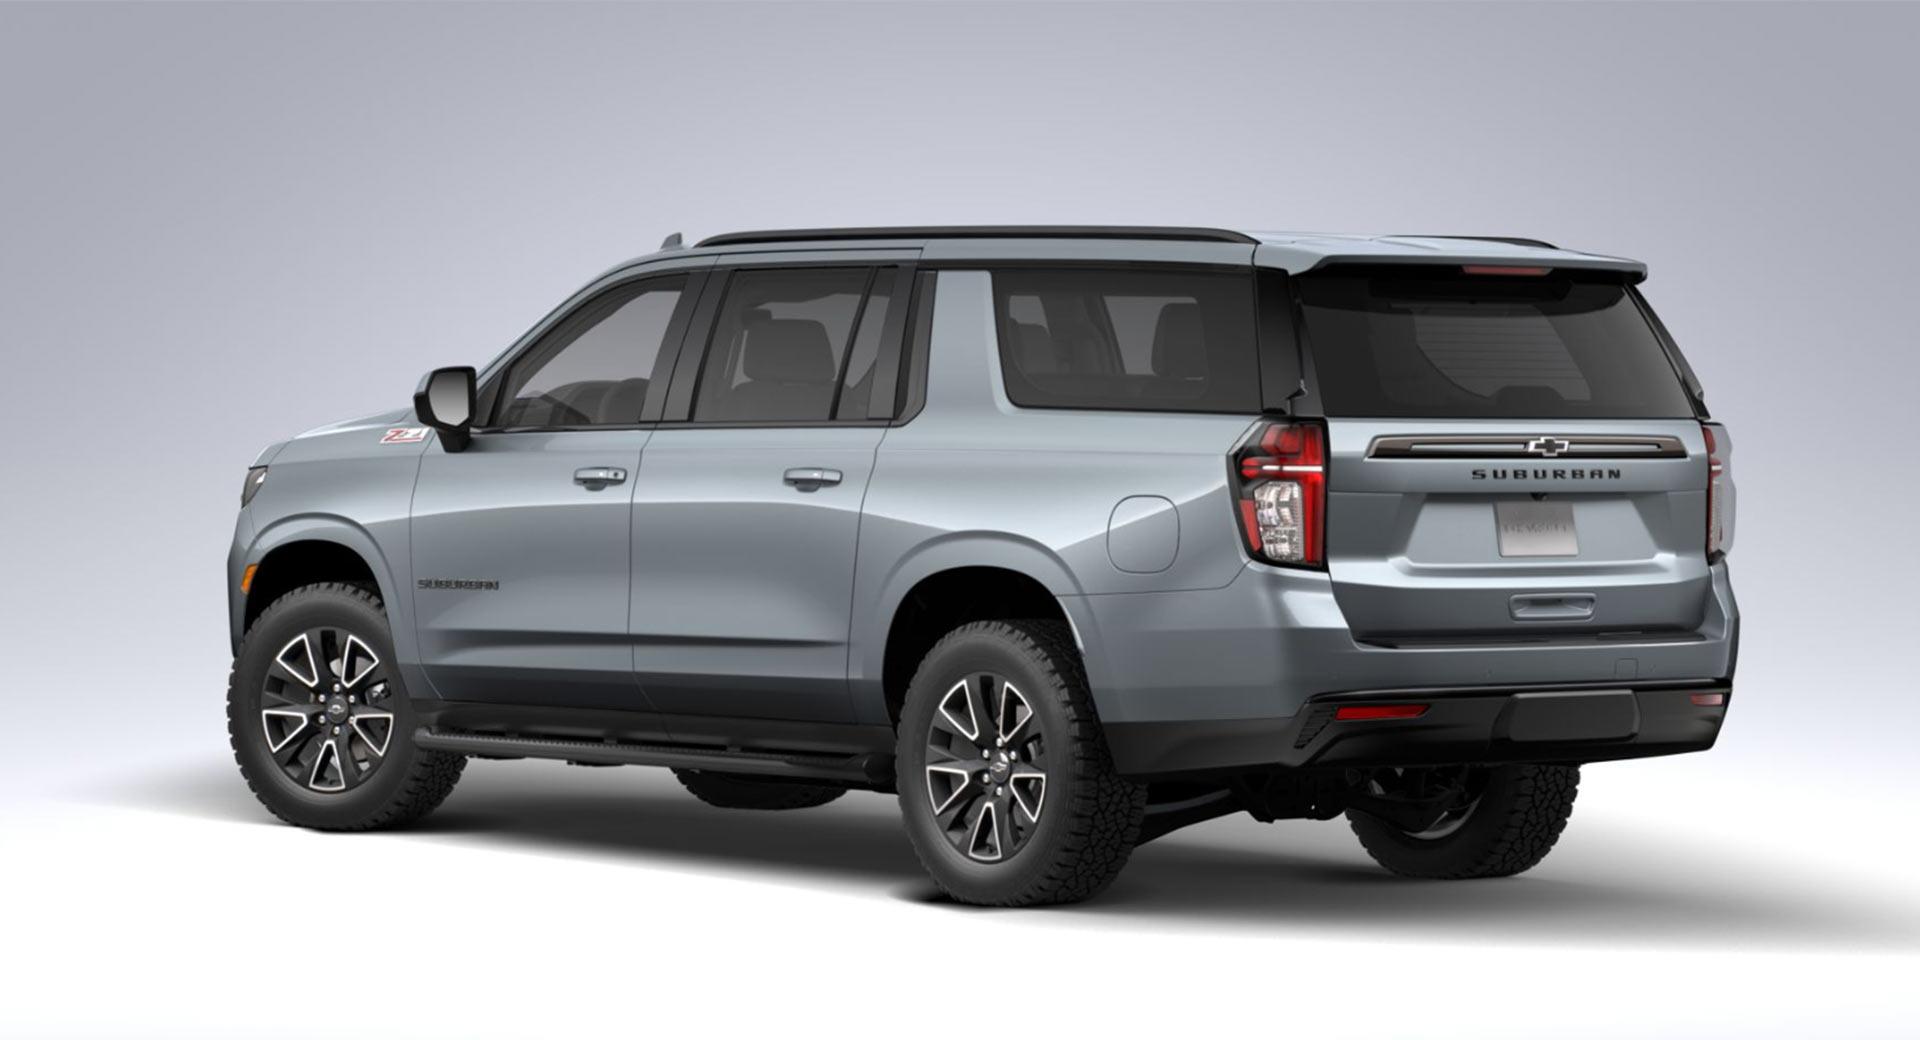 Chevrolet-Suburban-Z71-4